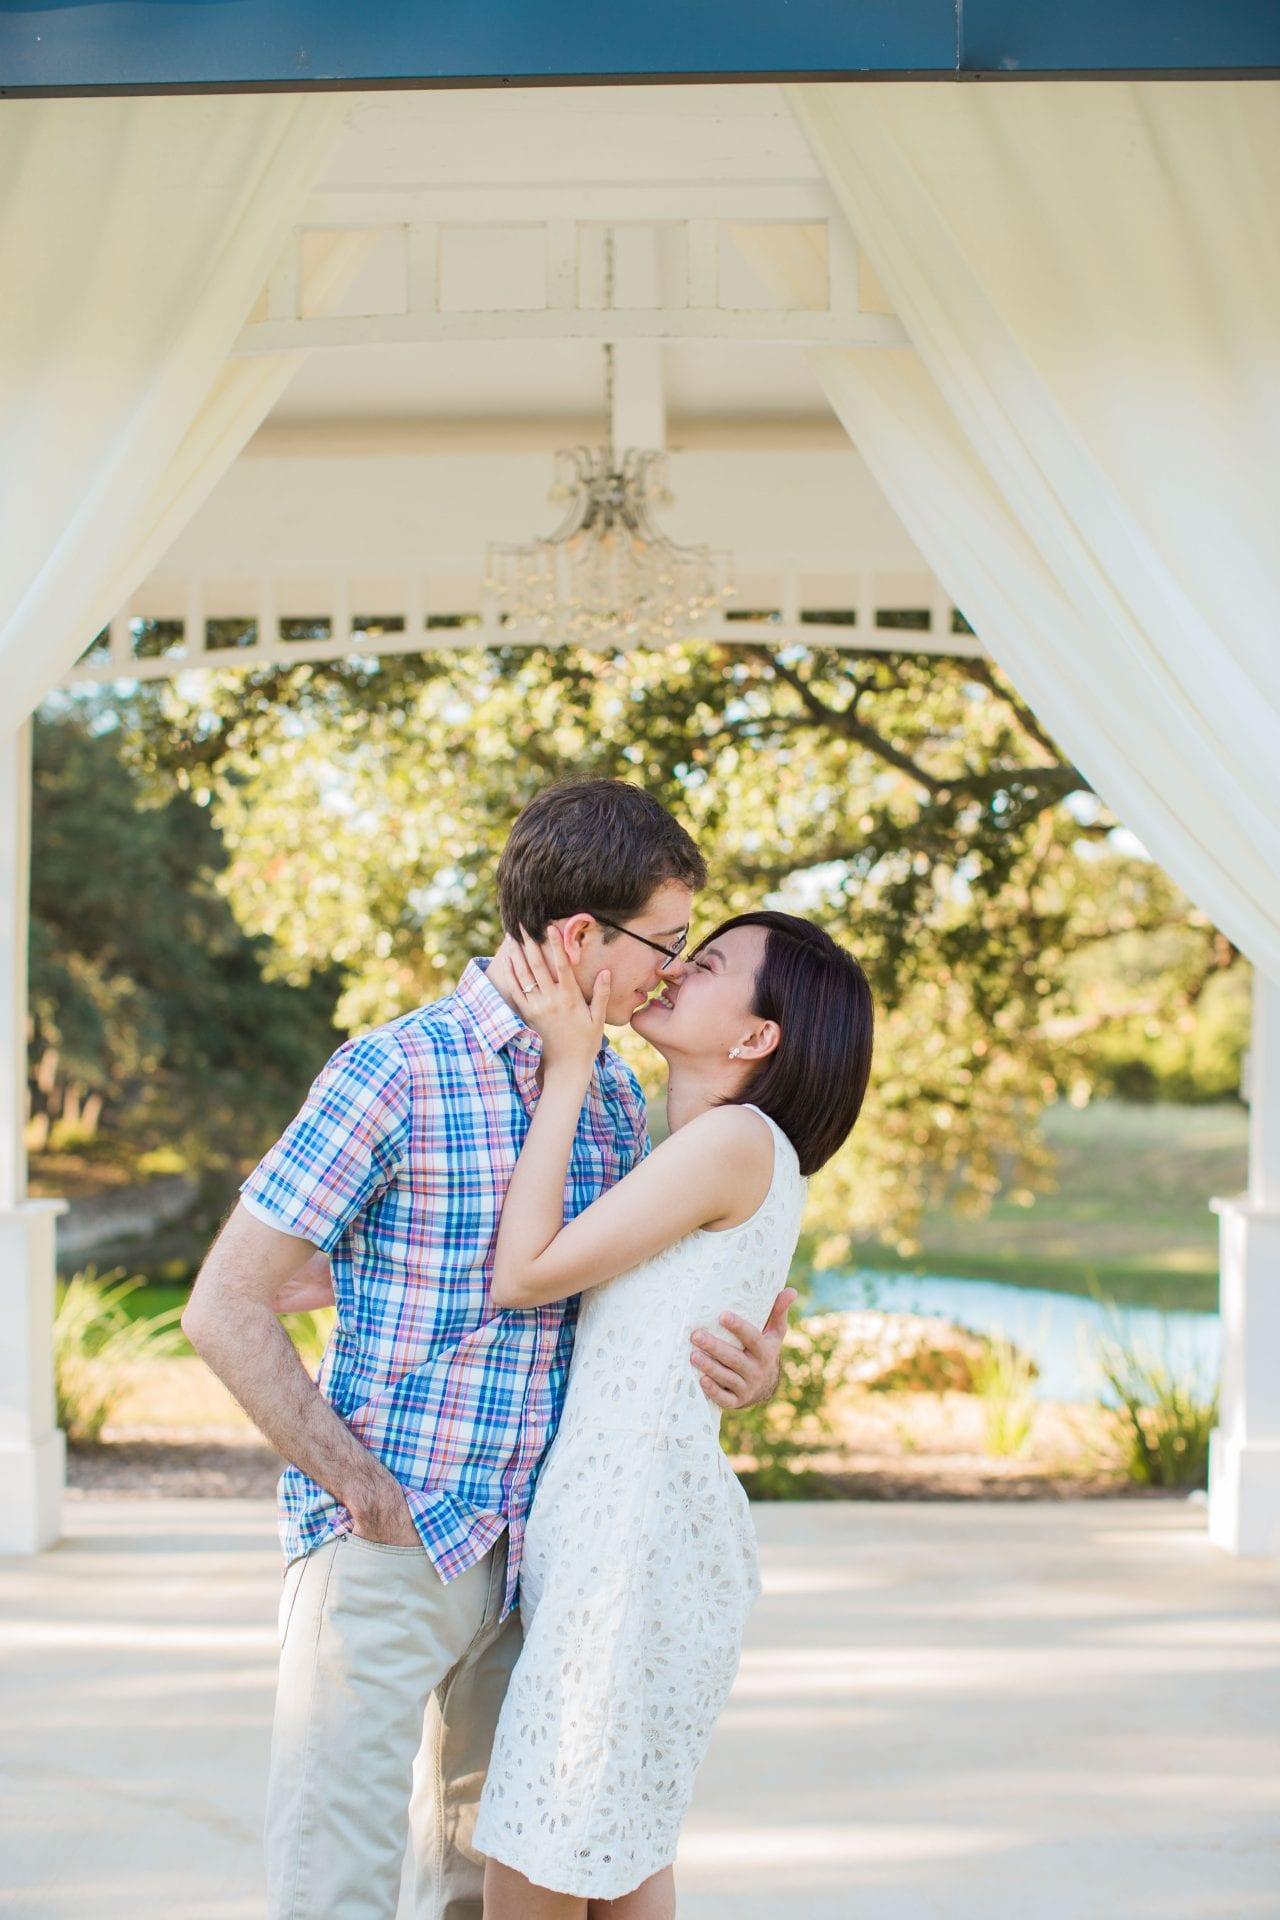 Josh and Tina engagement session at Kendal plantation kiss in the gazebo